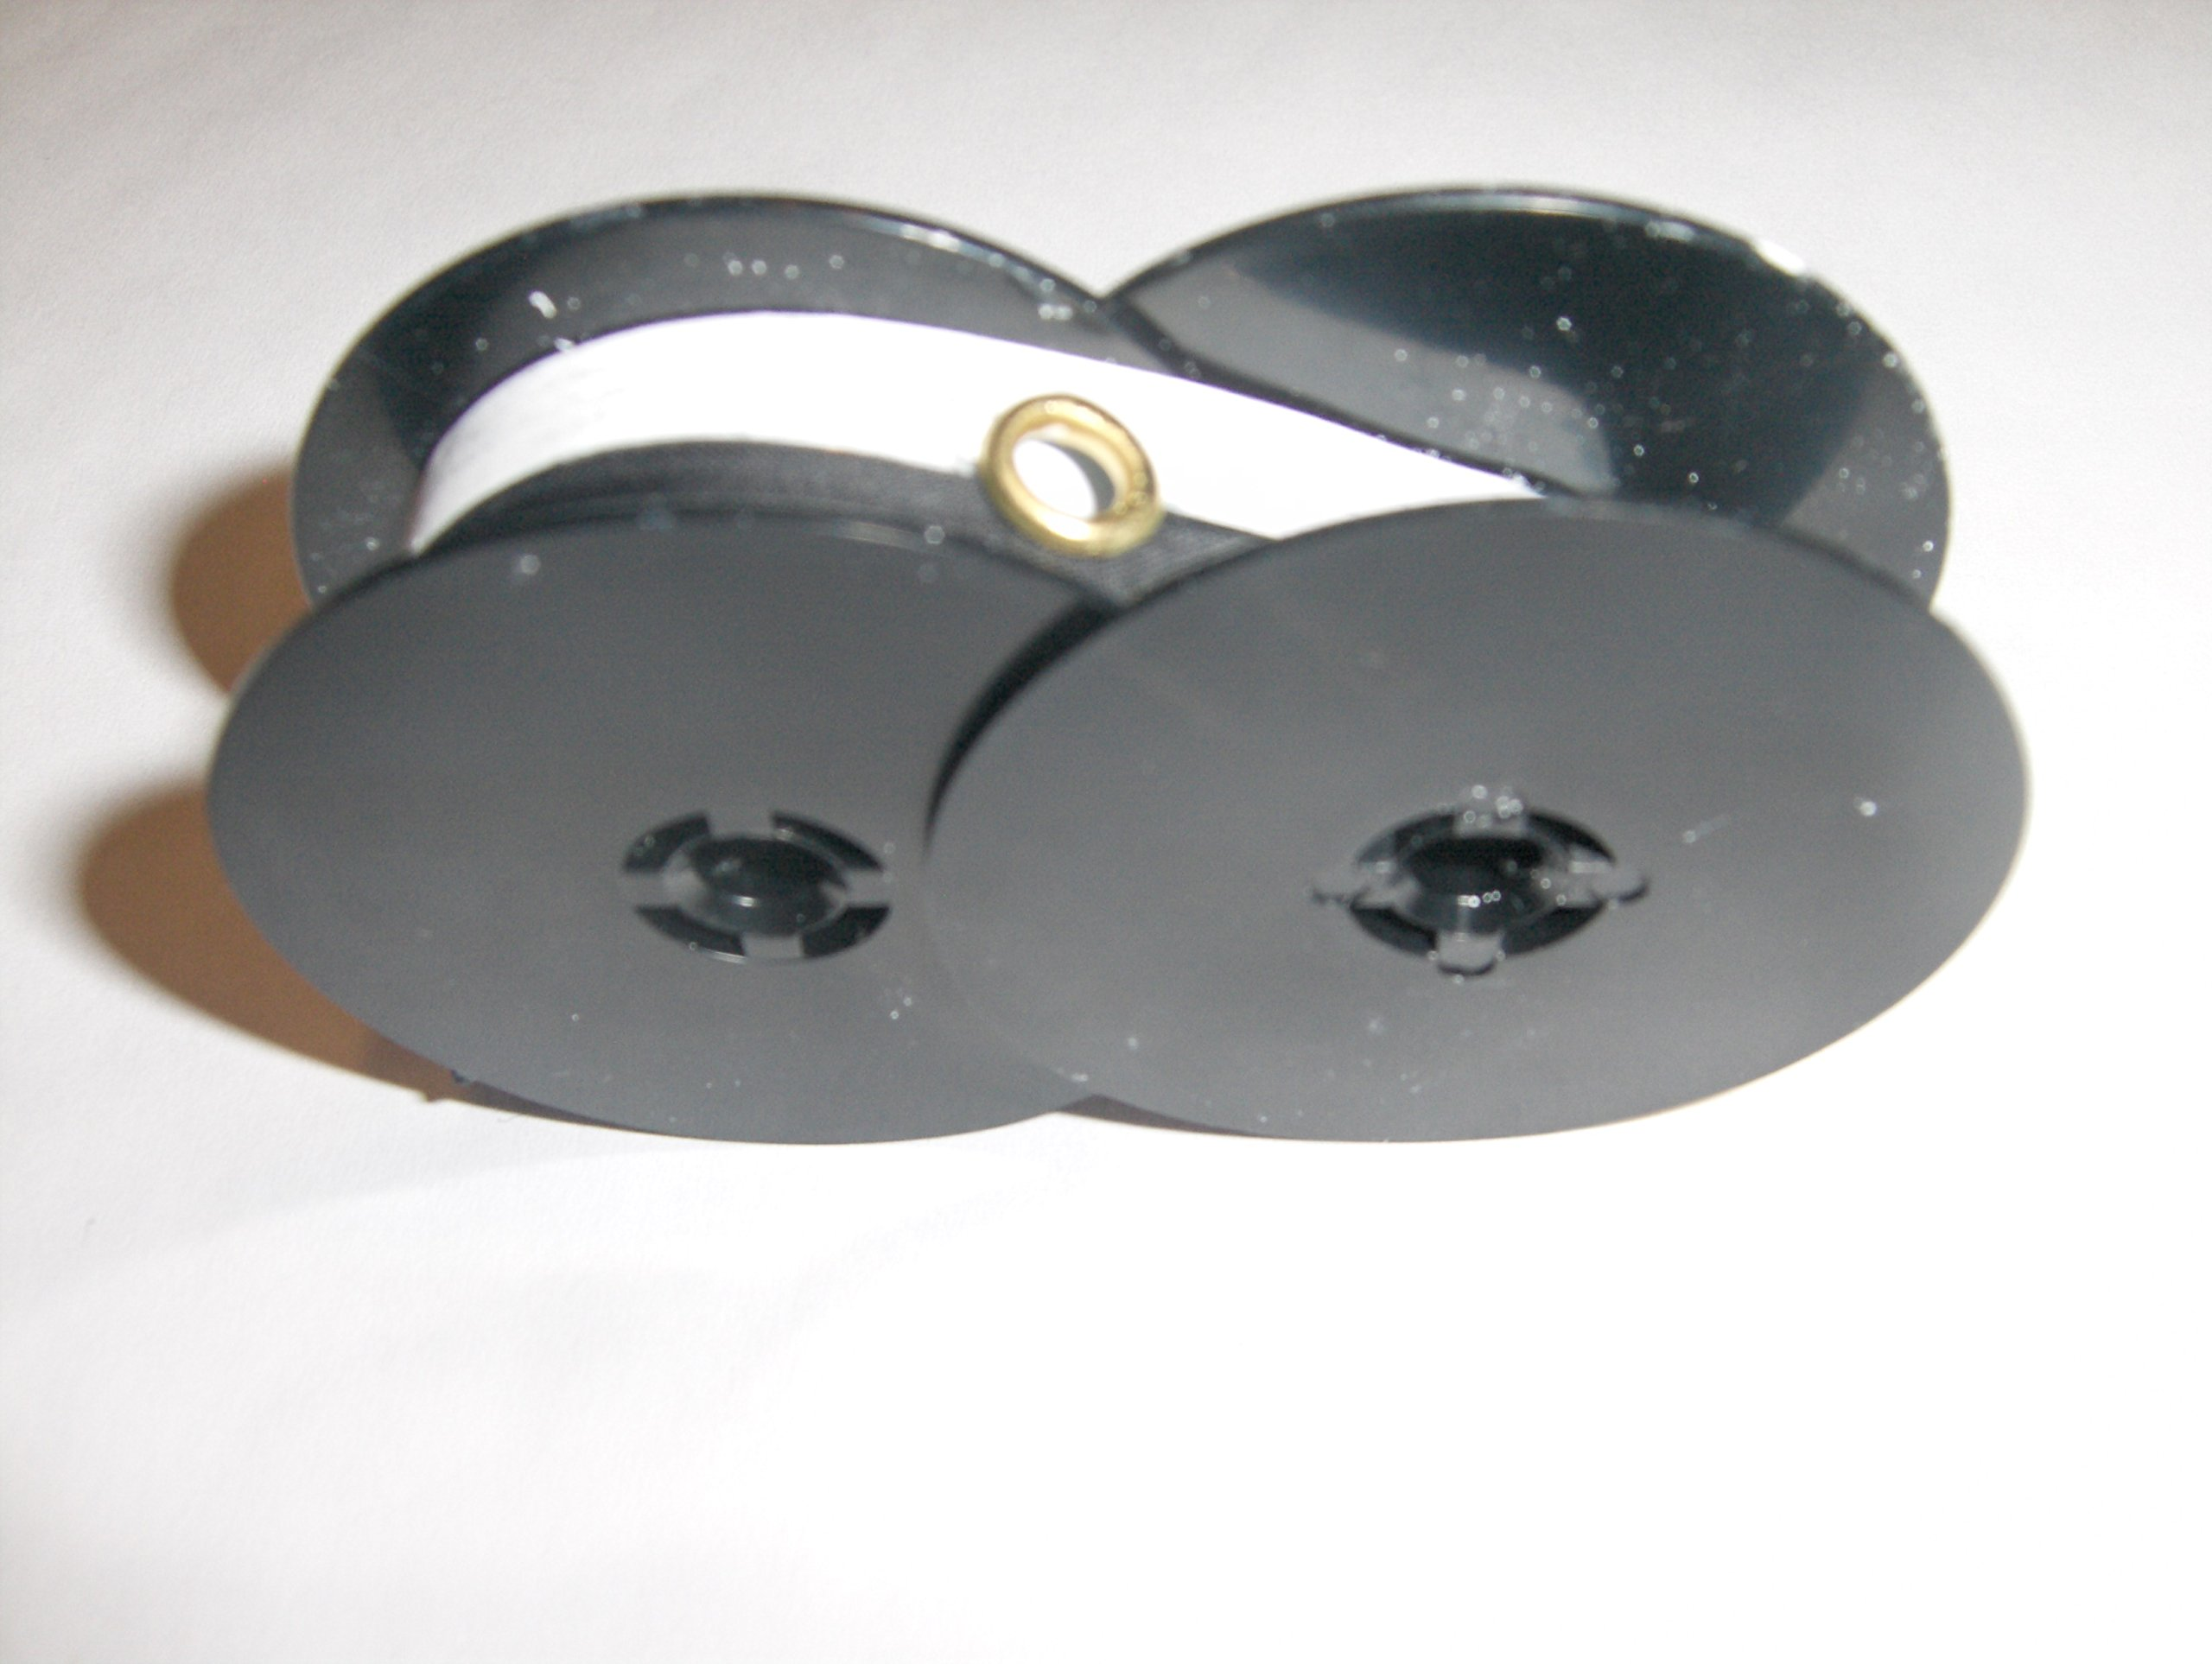 Nu-kote Model BW278 Black Nylon / White Correction Tape Typewriter Ribbon